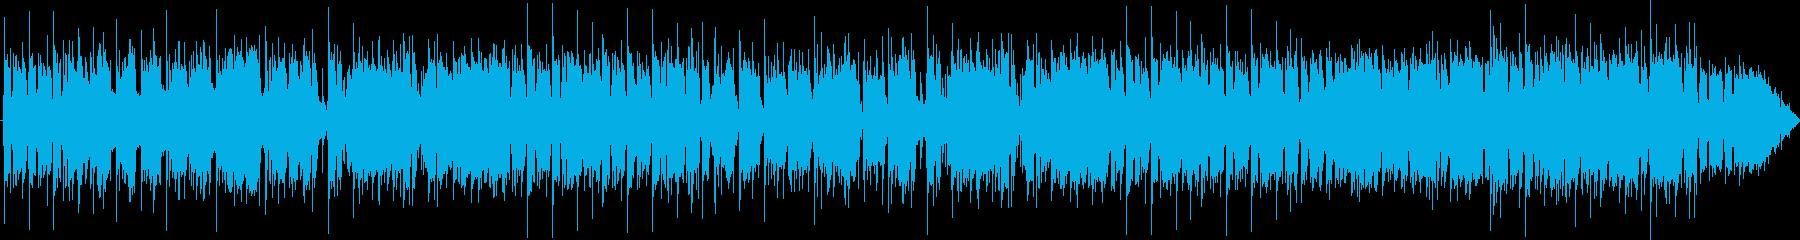 R&B風ジャズインストの再生済みの波形